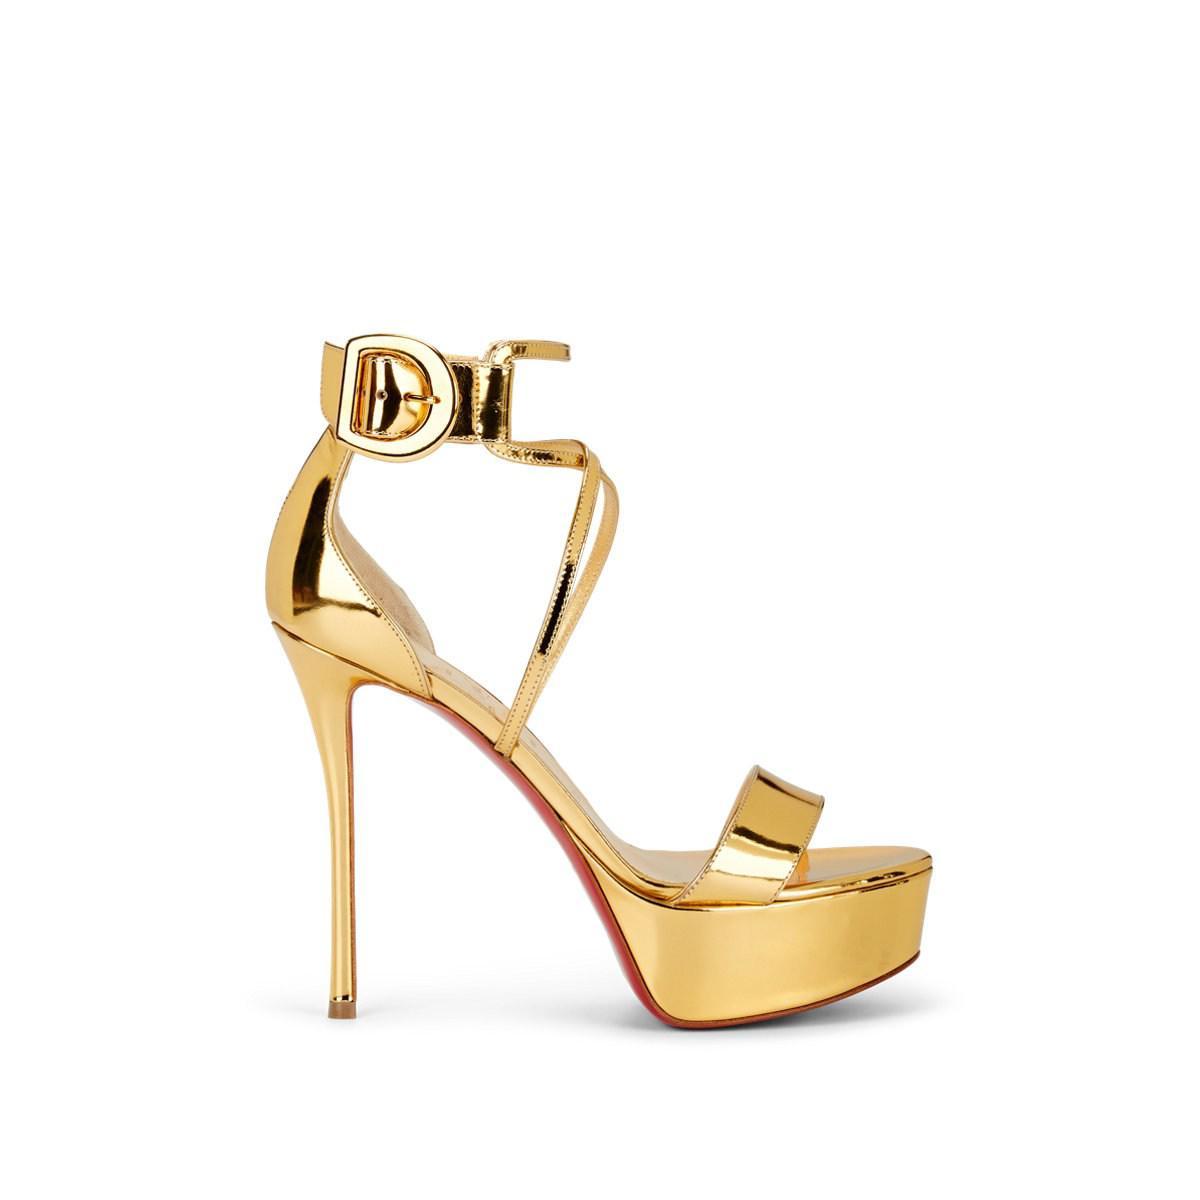 af556eb1ba14f Christian Louboutin Choca Specchio Leather Platform Sandals in ...